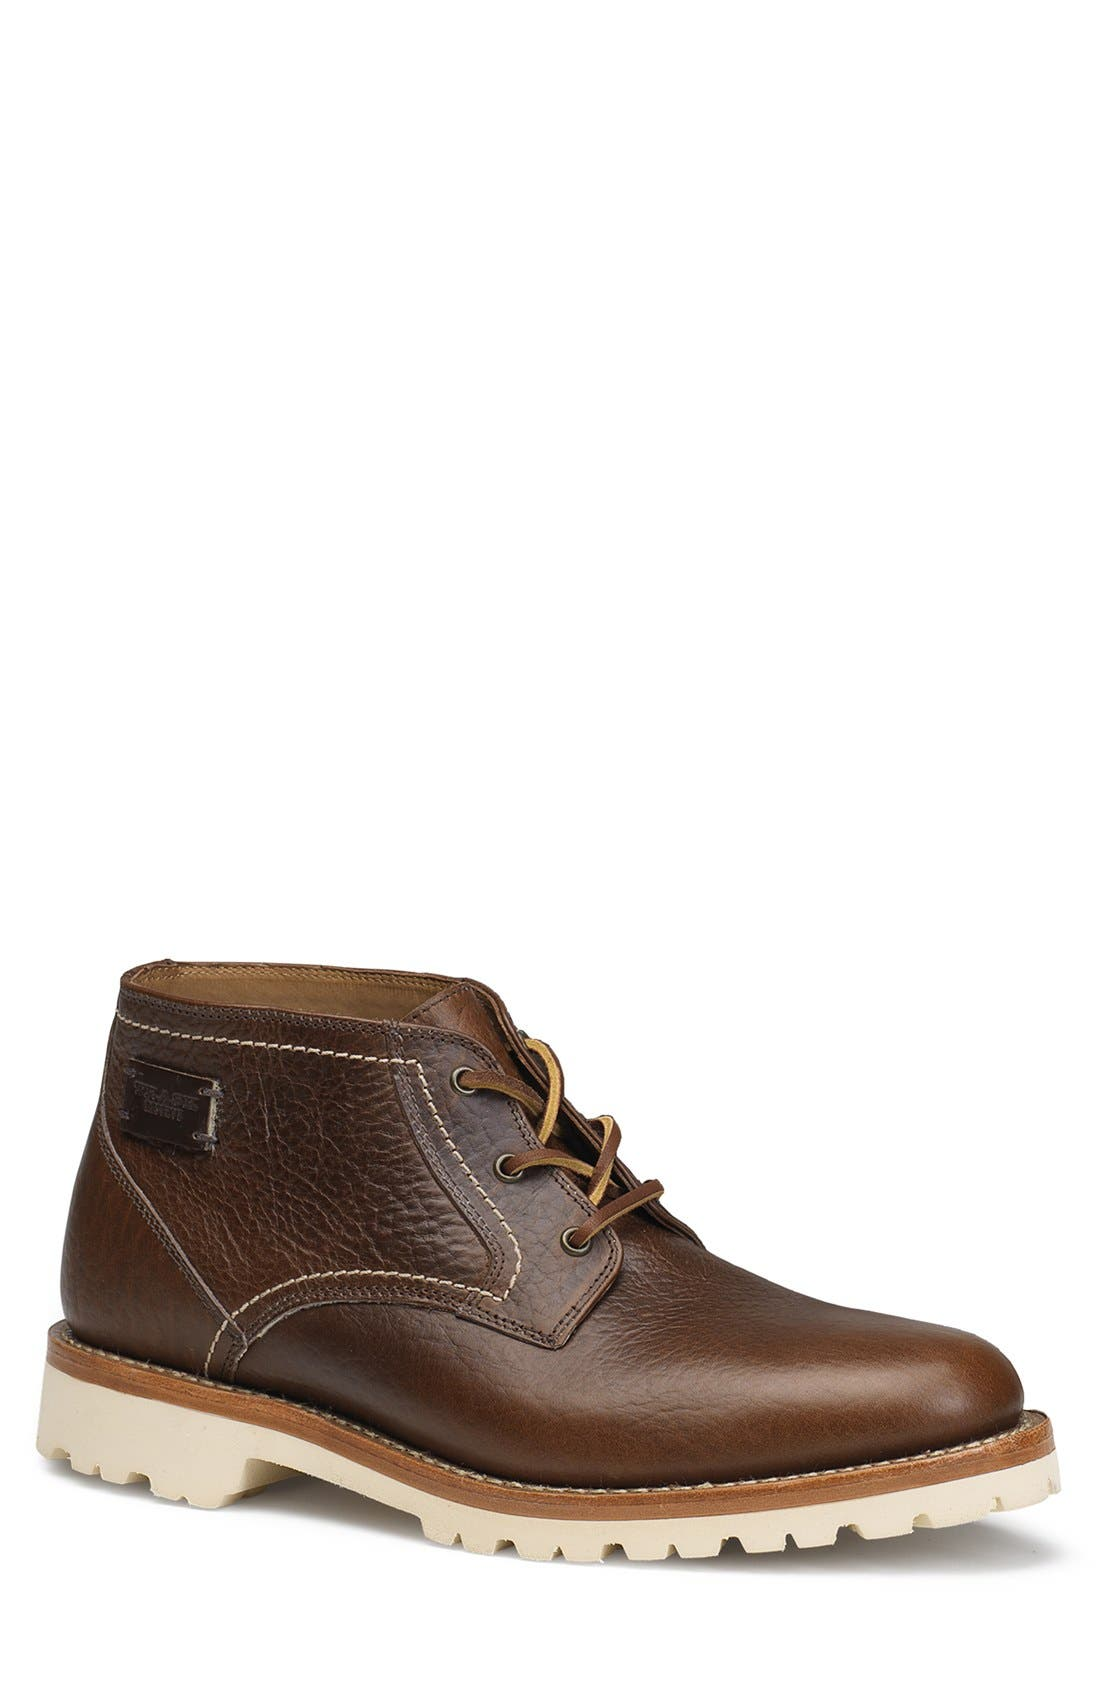 'Bighorn' Plain Toe Boot,                         Main,                         color,